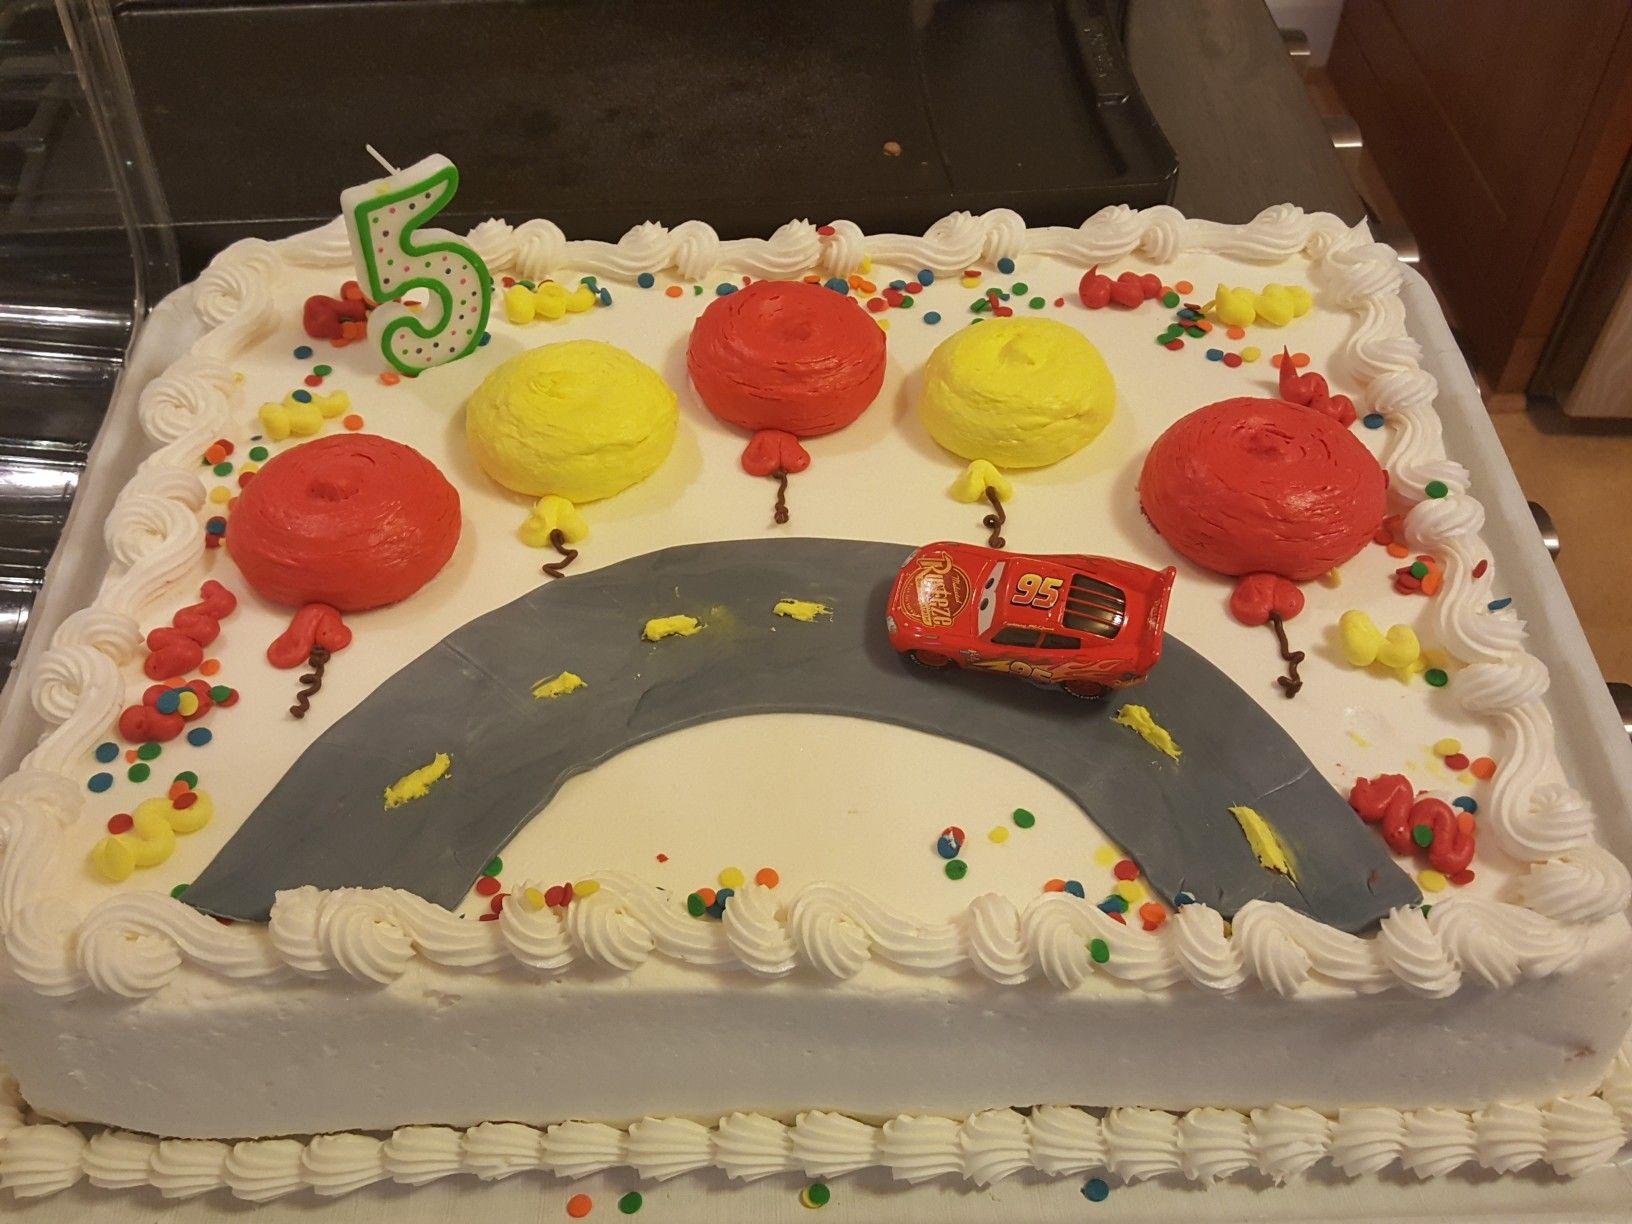 Costco cake hack. Lightning McQueen | cakes | Pinterest | Costco ...